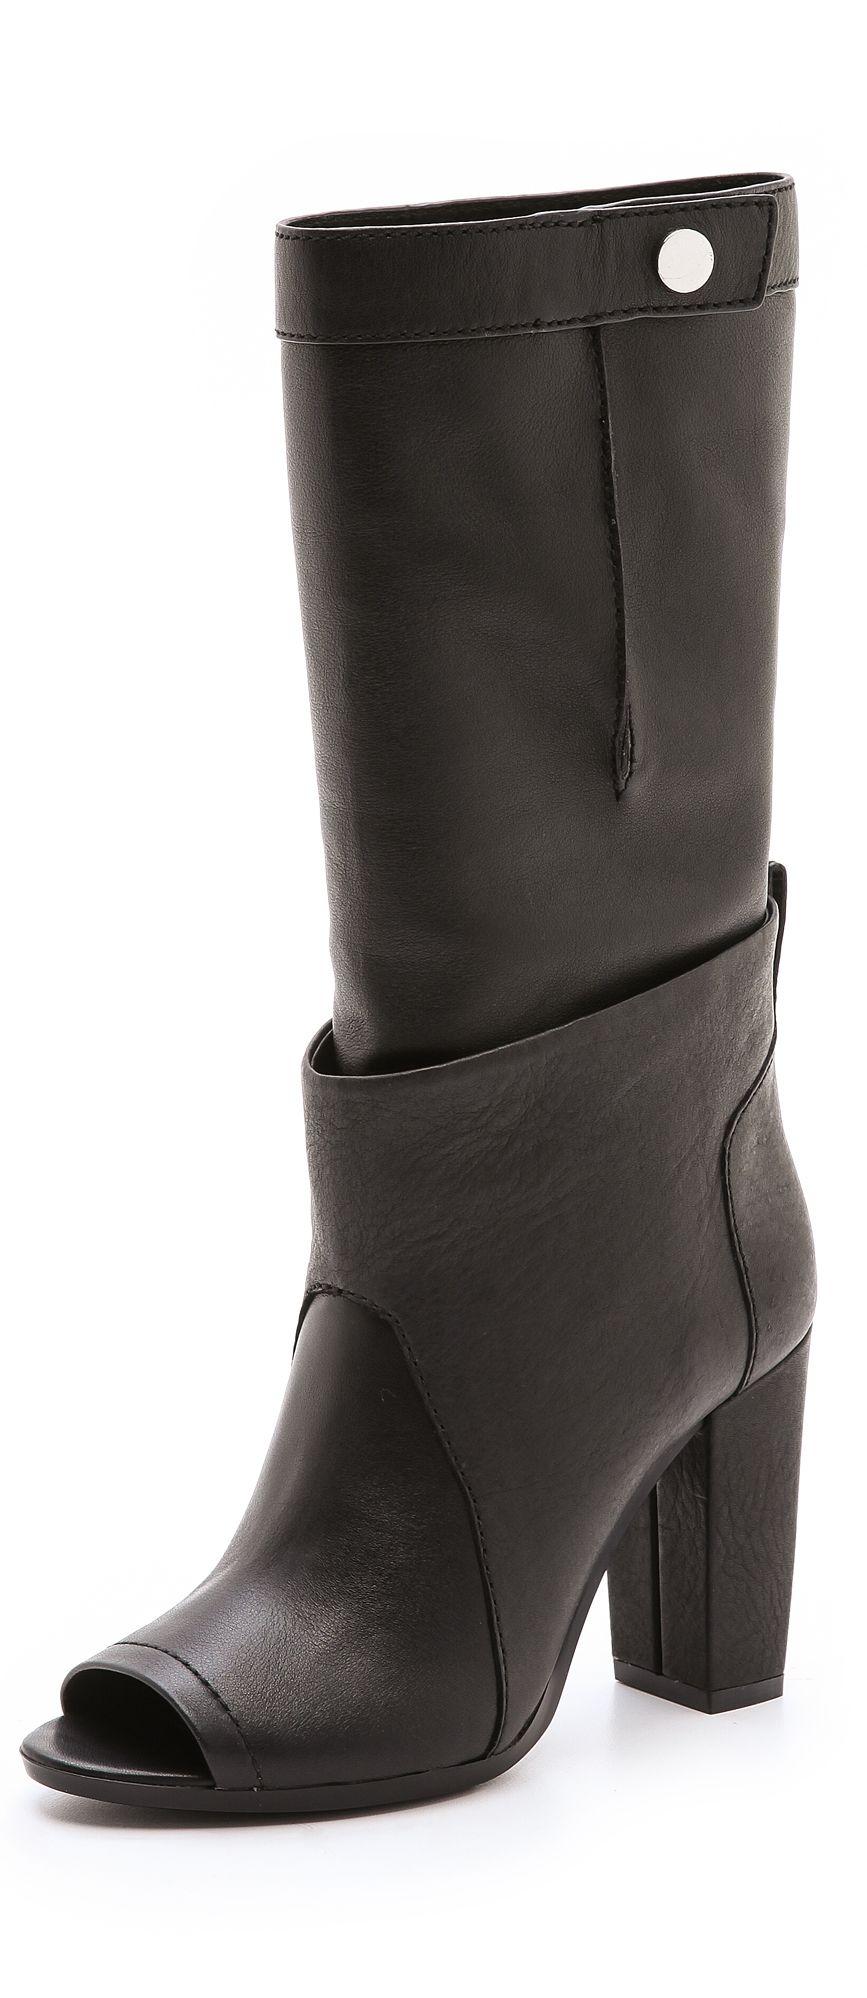 3.1 Phillip Lim Leather Peep-Toe Booties cheap nicekicks sale pick a best 2014 new sale online Jyt0kG05Hh